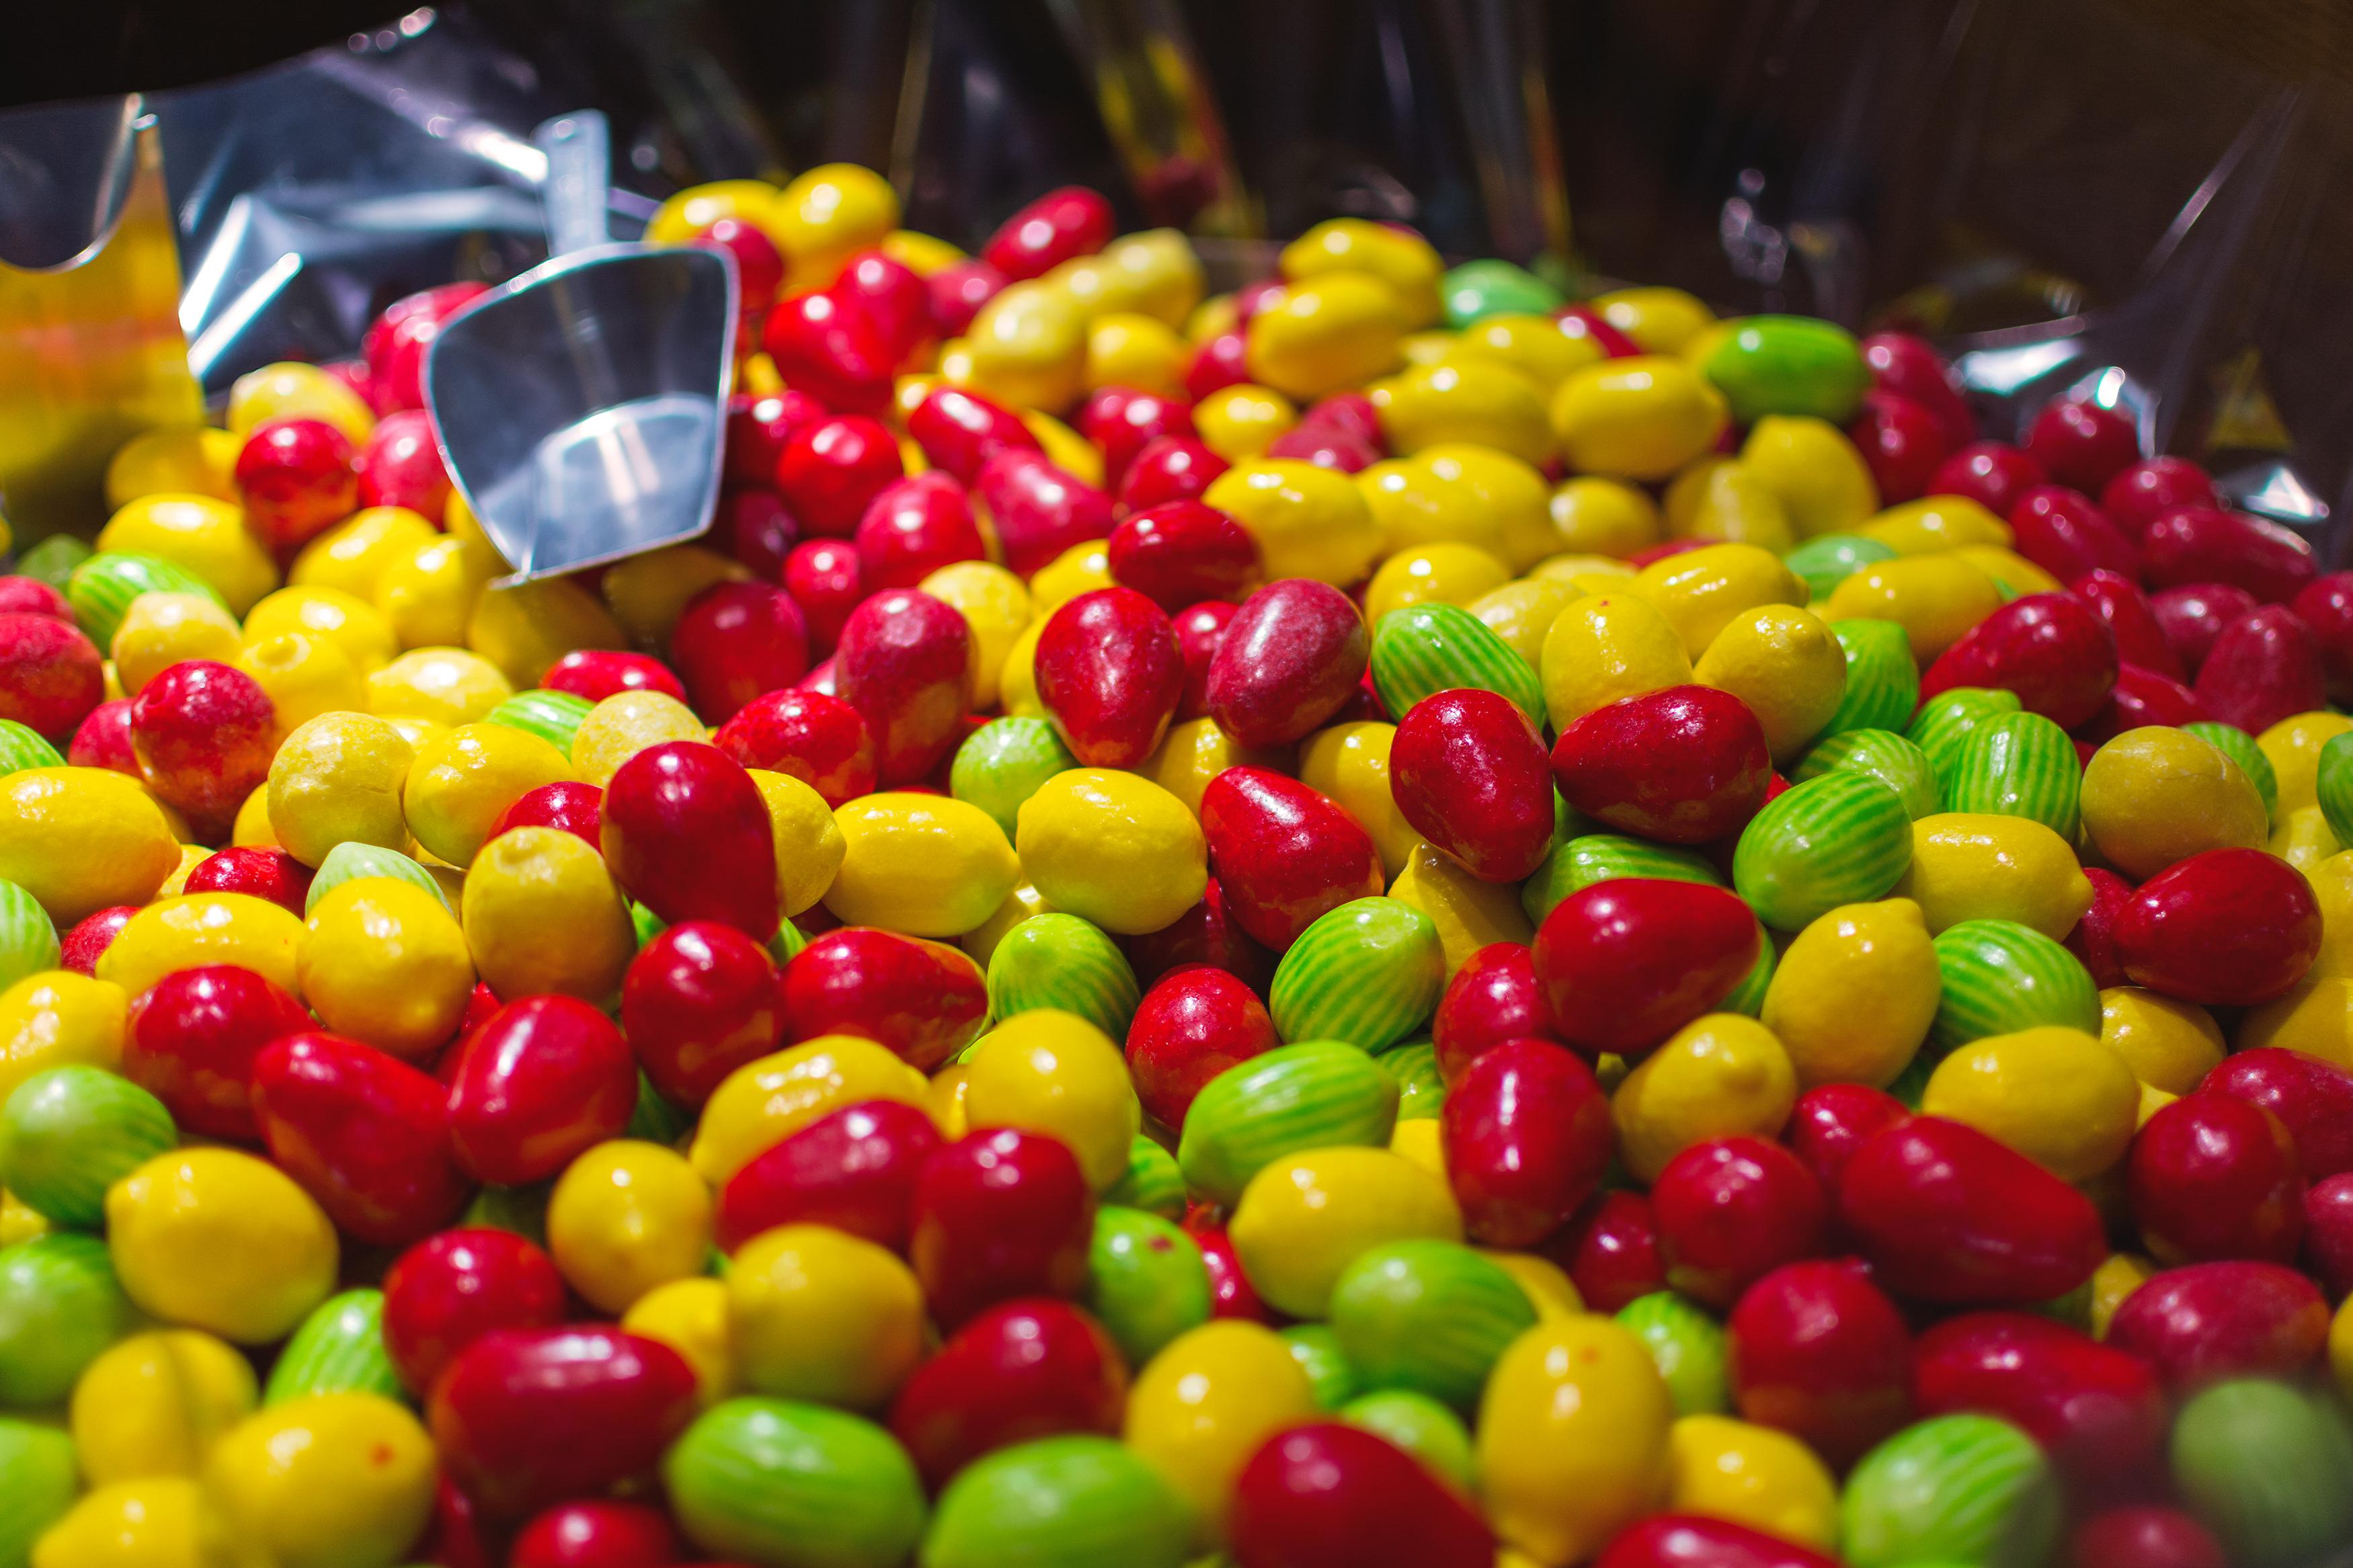 free image colorful candy libreshot public domain photos